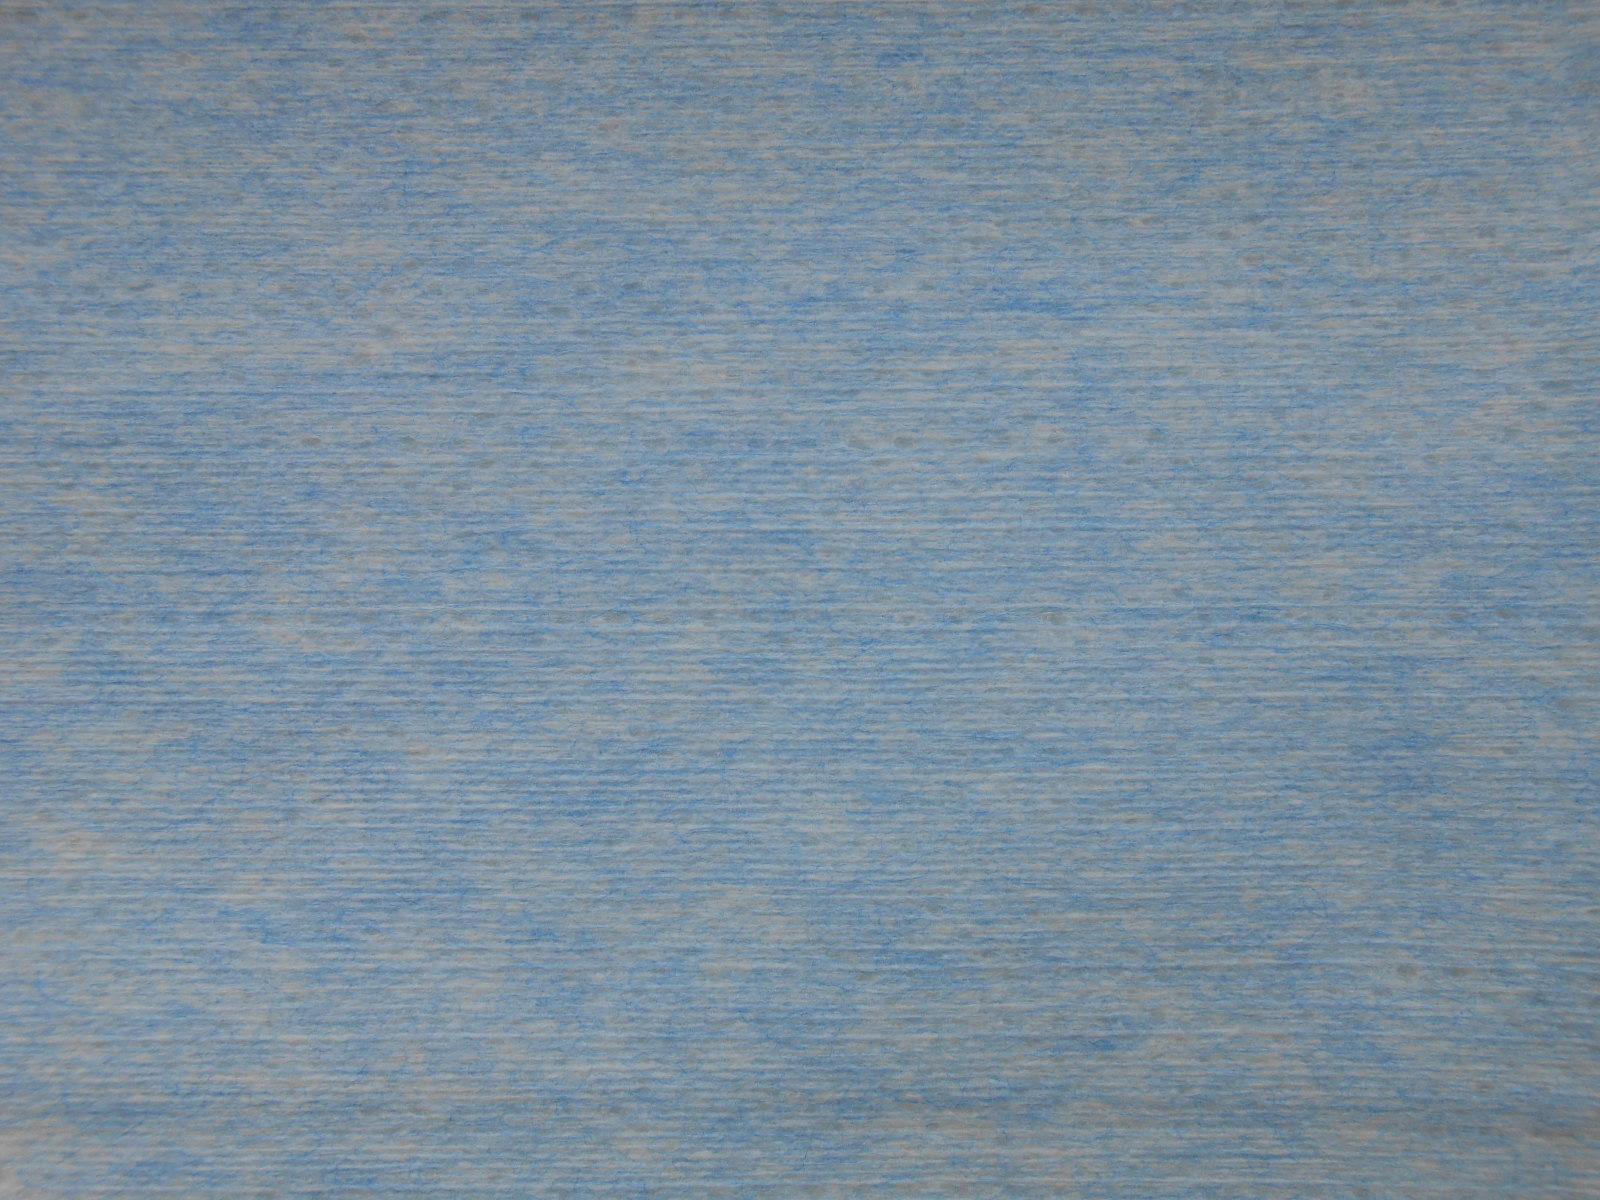 SOFTEXTRA blue rolldisp. 38x30cm 1x390sh